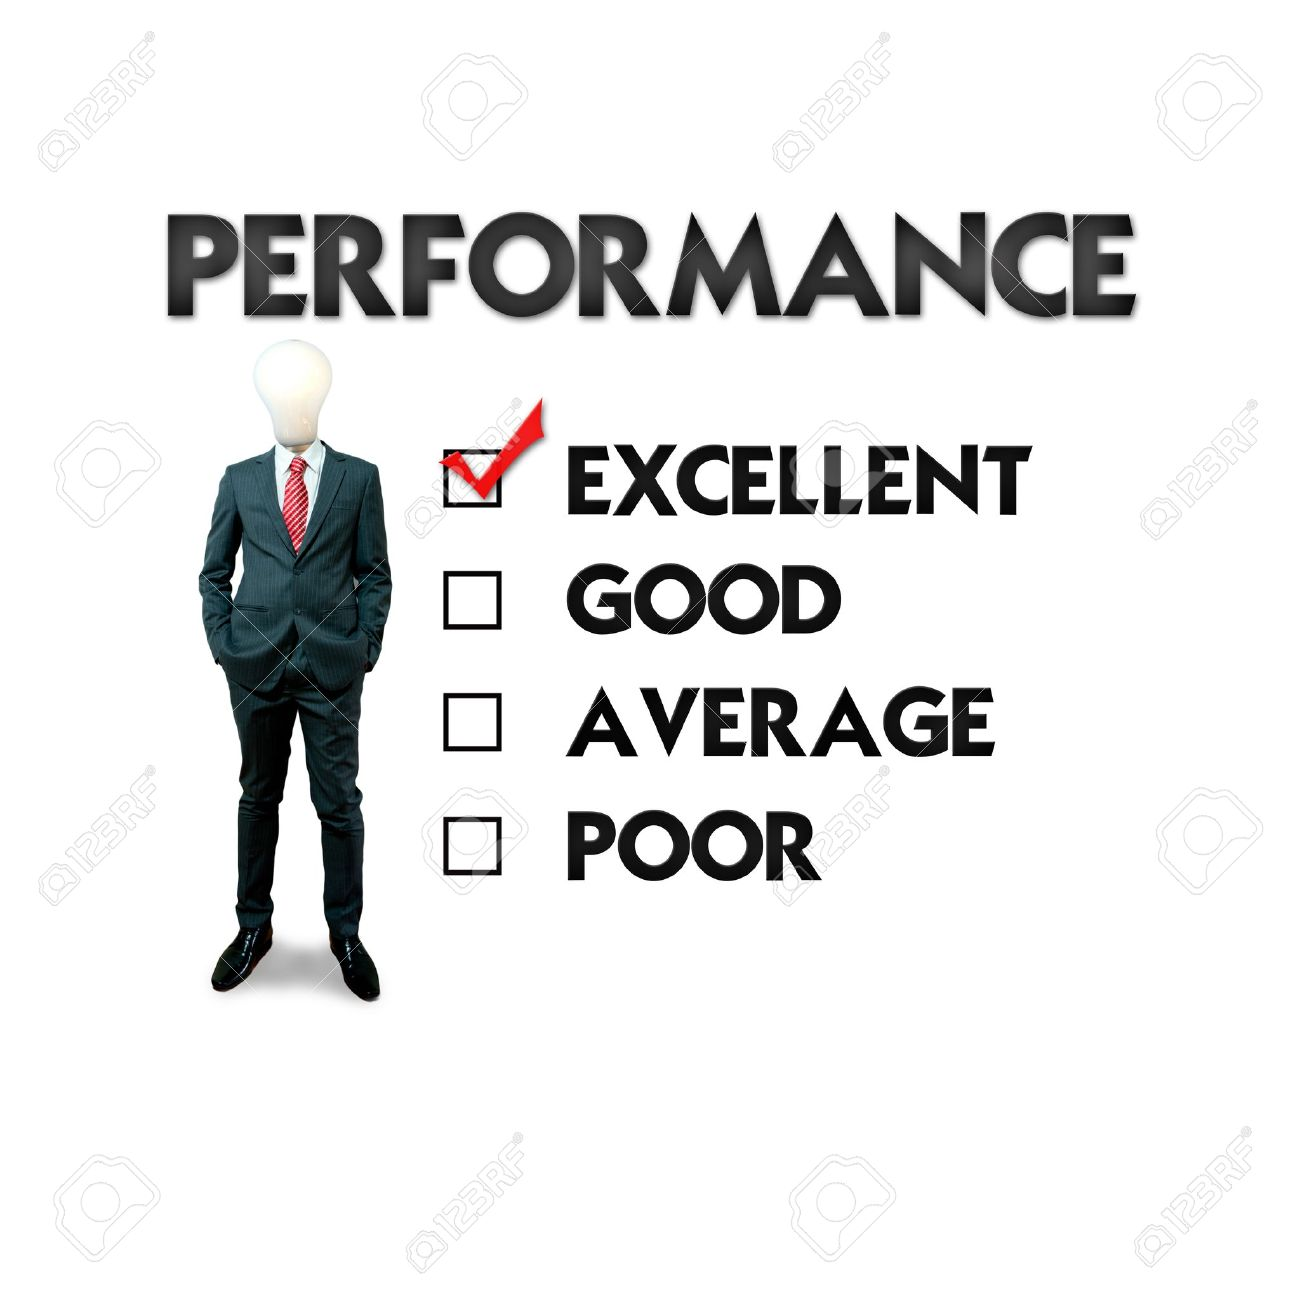 Performance appraisal clipart.